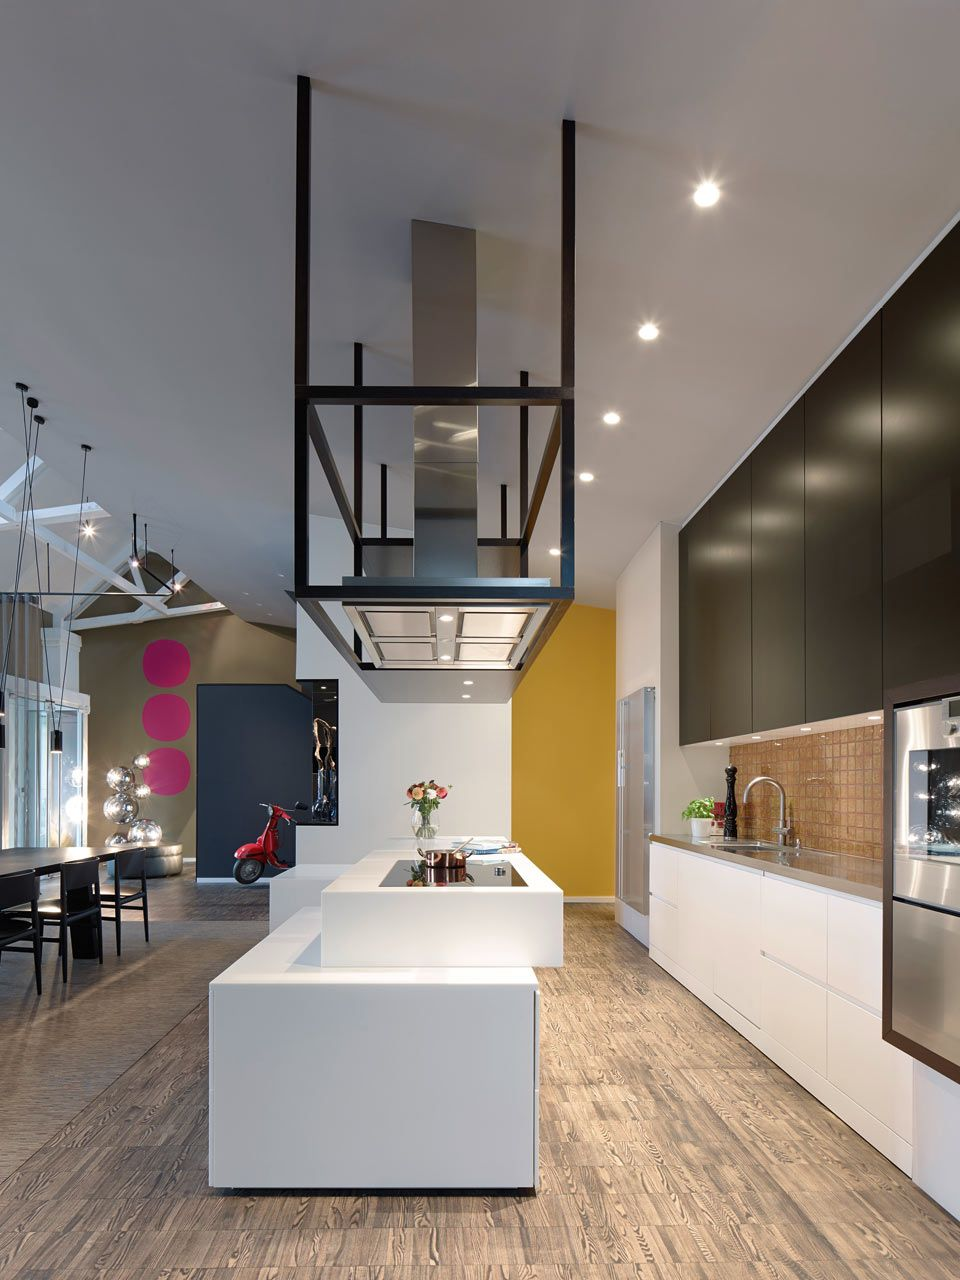 Loft Esn Ippolito Fleitz Group 4 In 2018 Kitchen Loft Cuisine